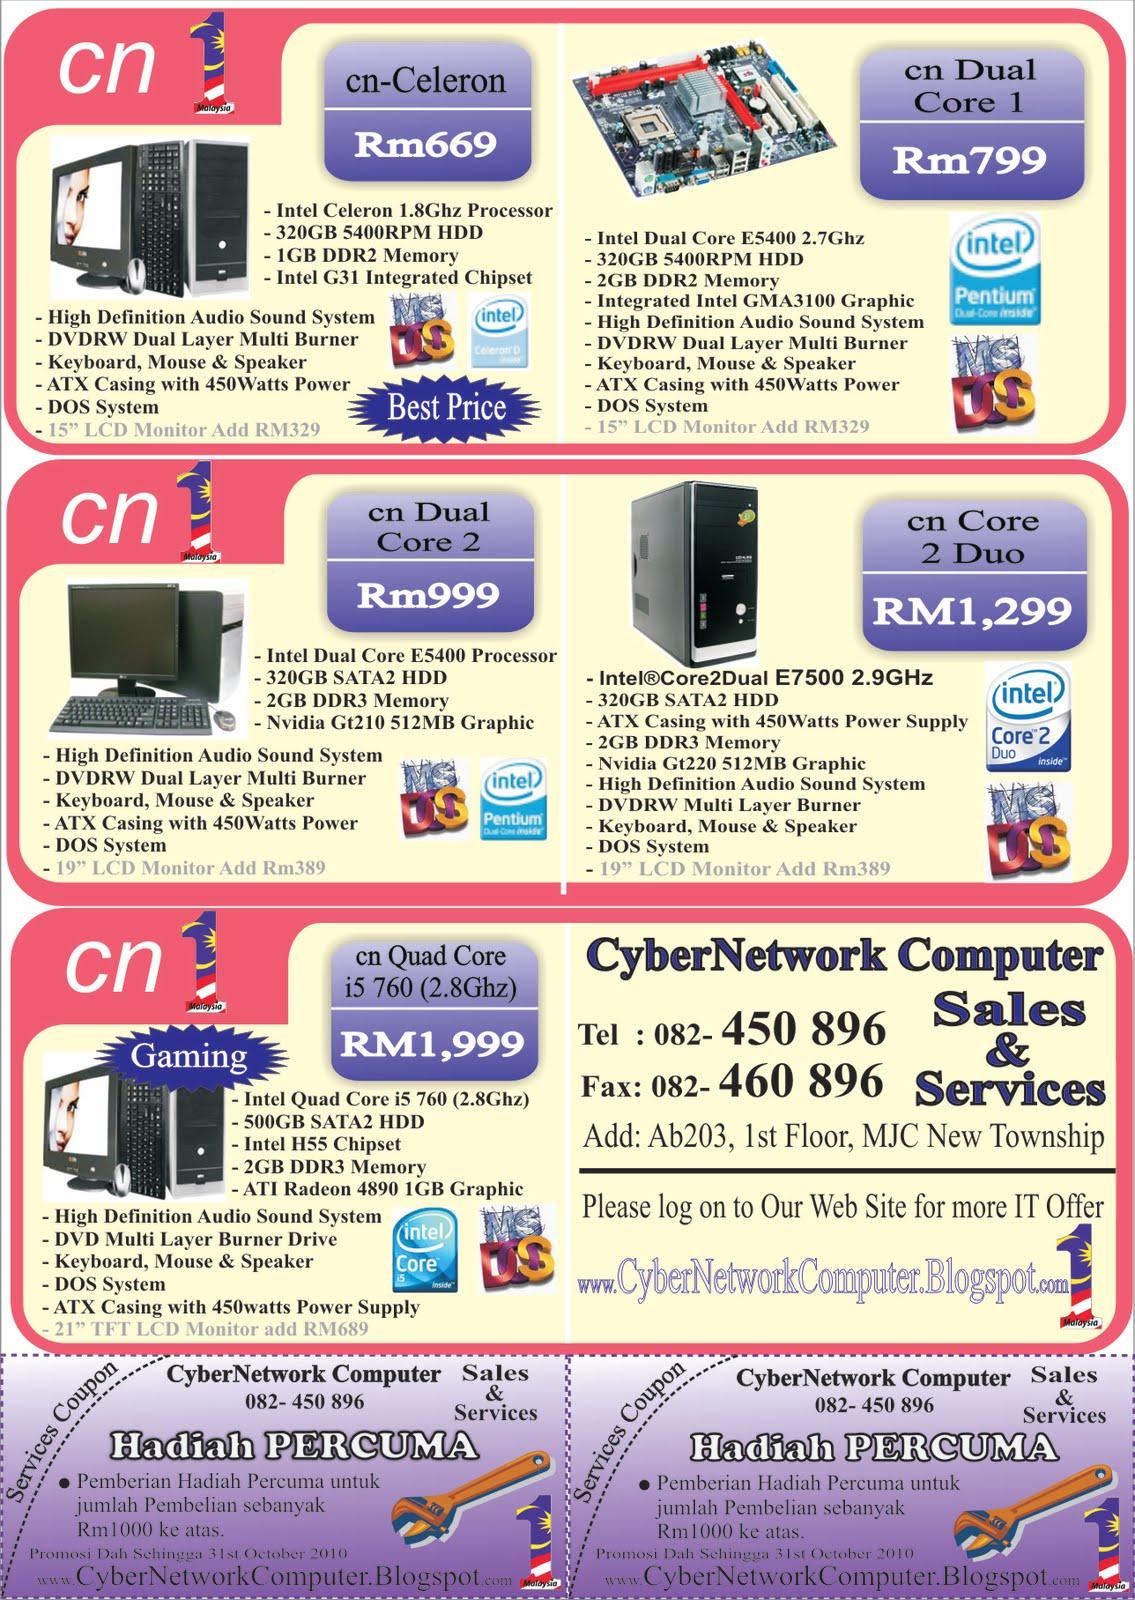 cybernetwork computer sales services desktop pc promotion. Black Bedroom Furniture Sets. Home Design Ideas